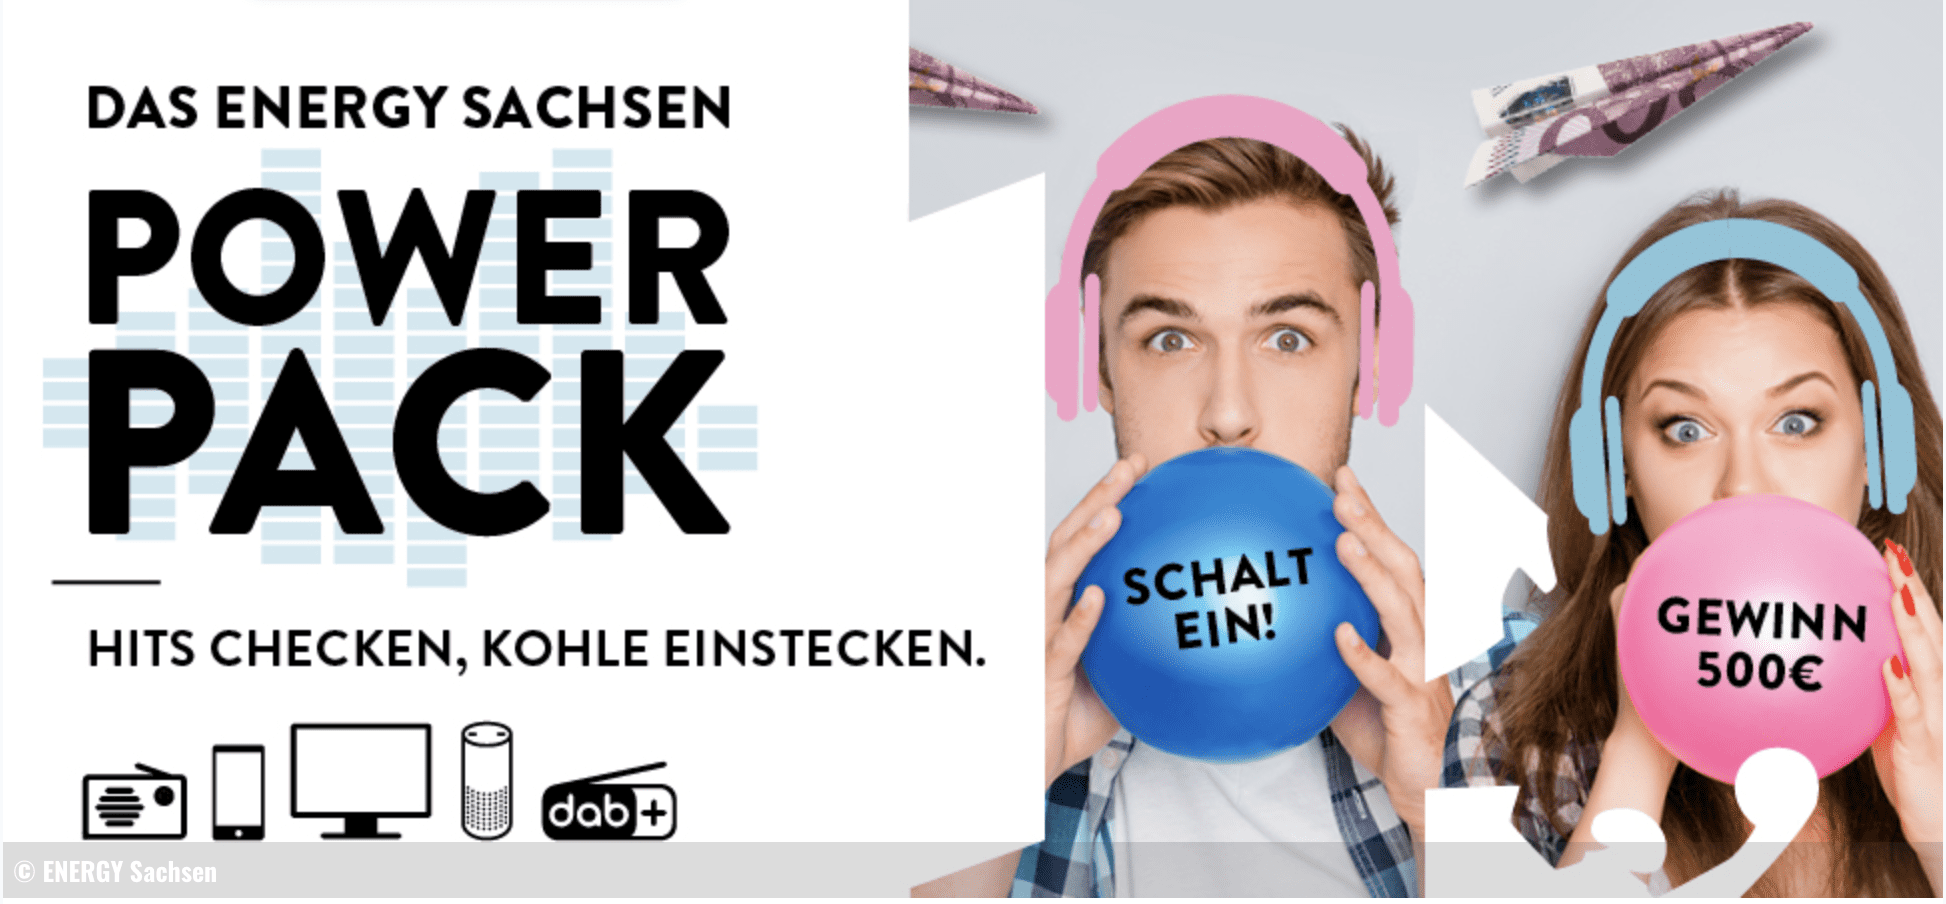 Gewinnspiel-Cases Radio & TV Energy Sachsen